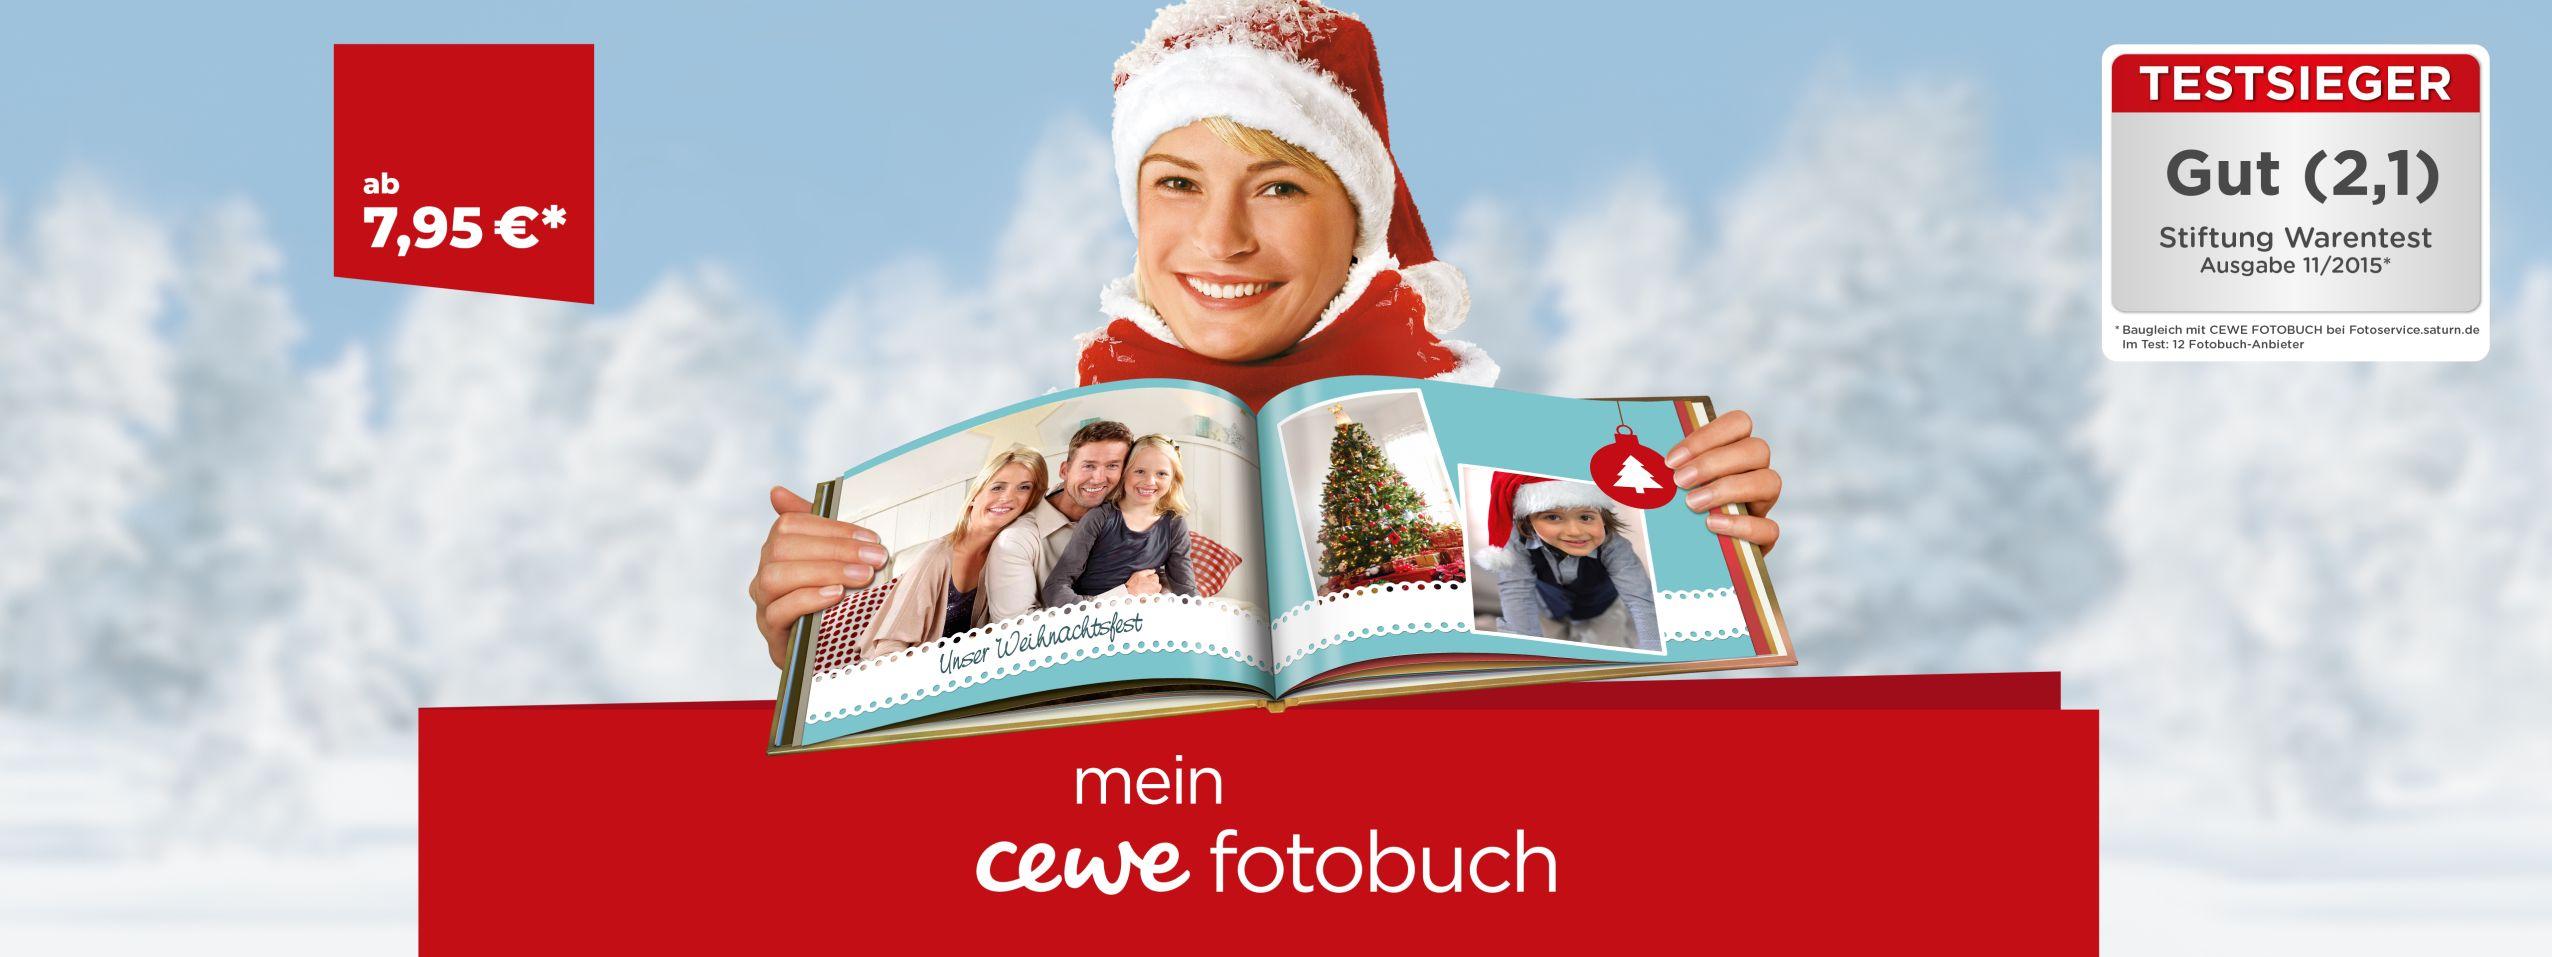 Cewe Fotoservice Cewe Fotobuch Fotos Und Mehr